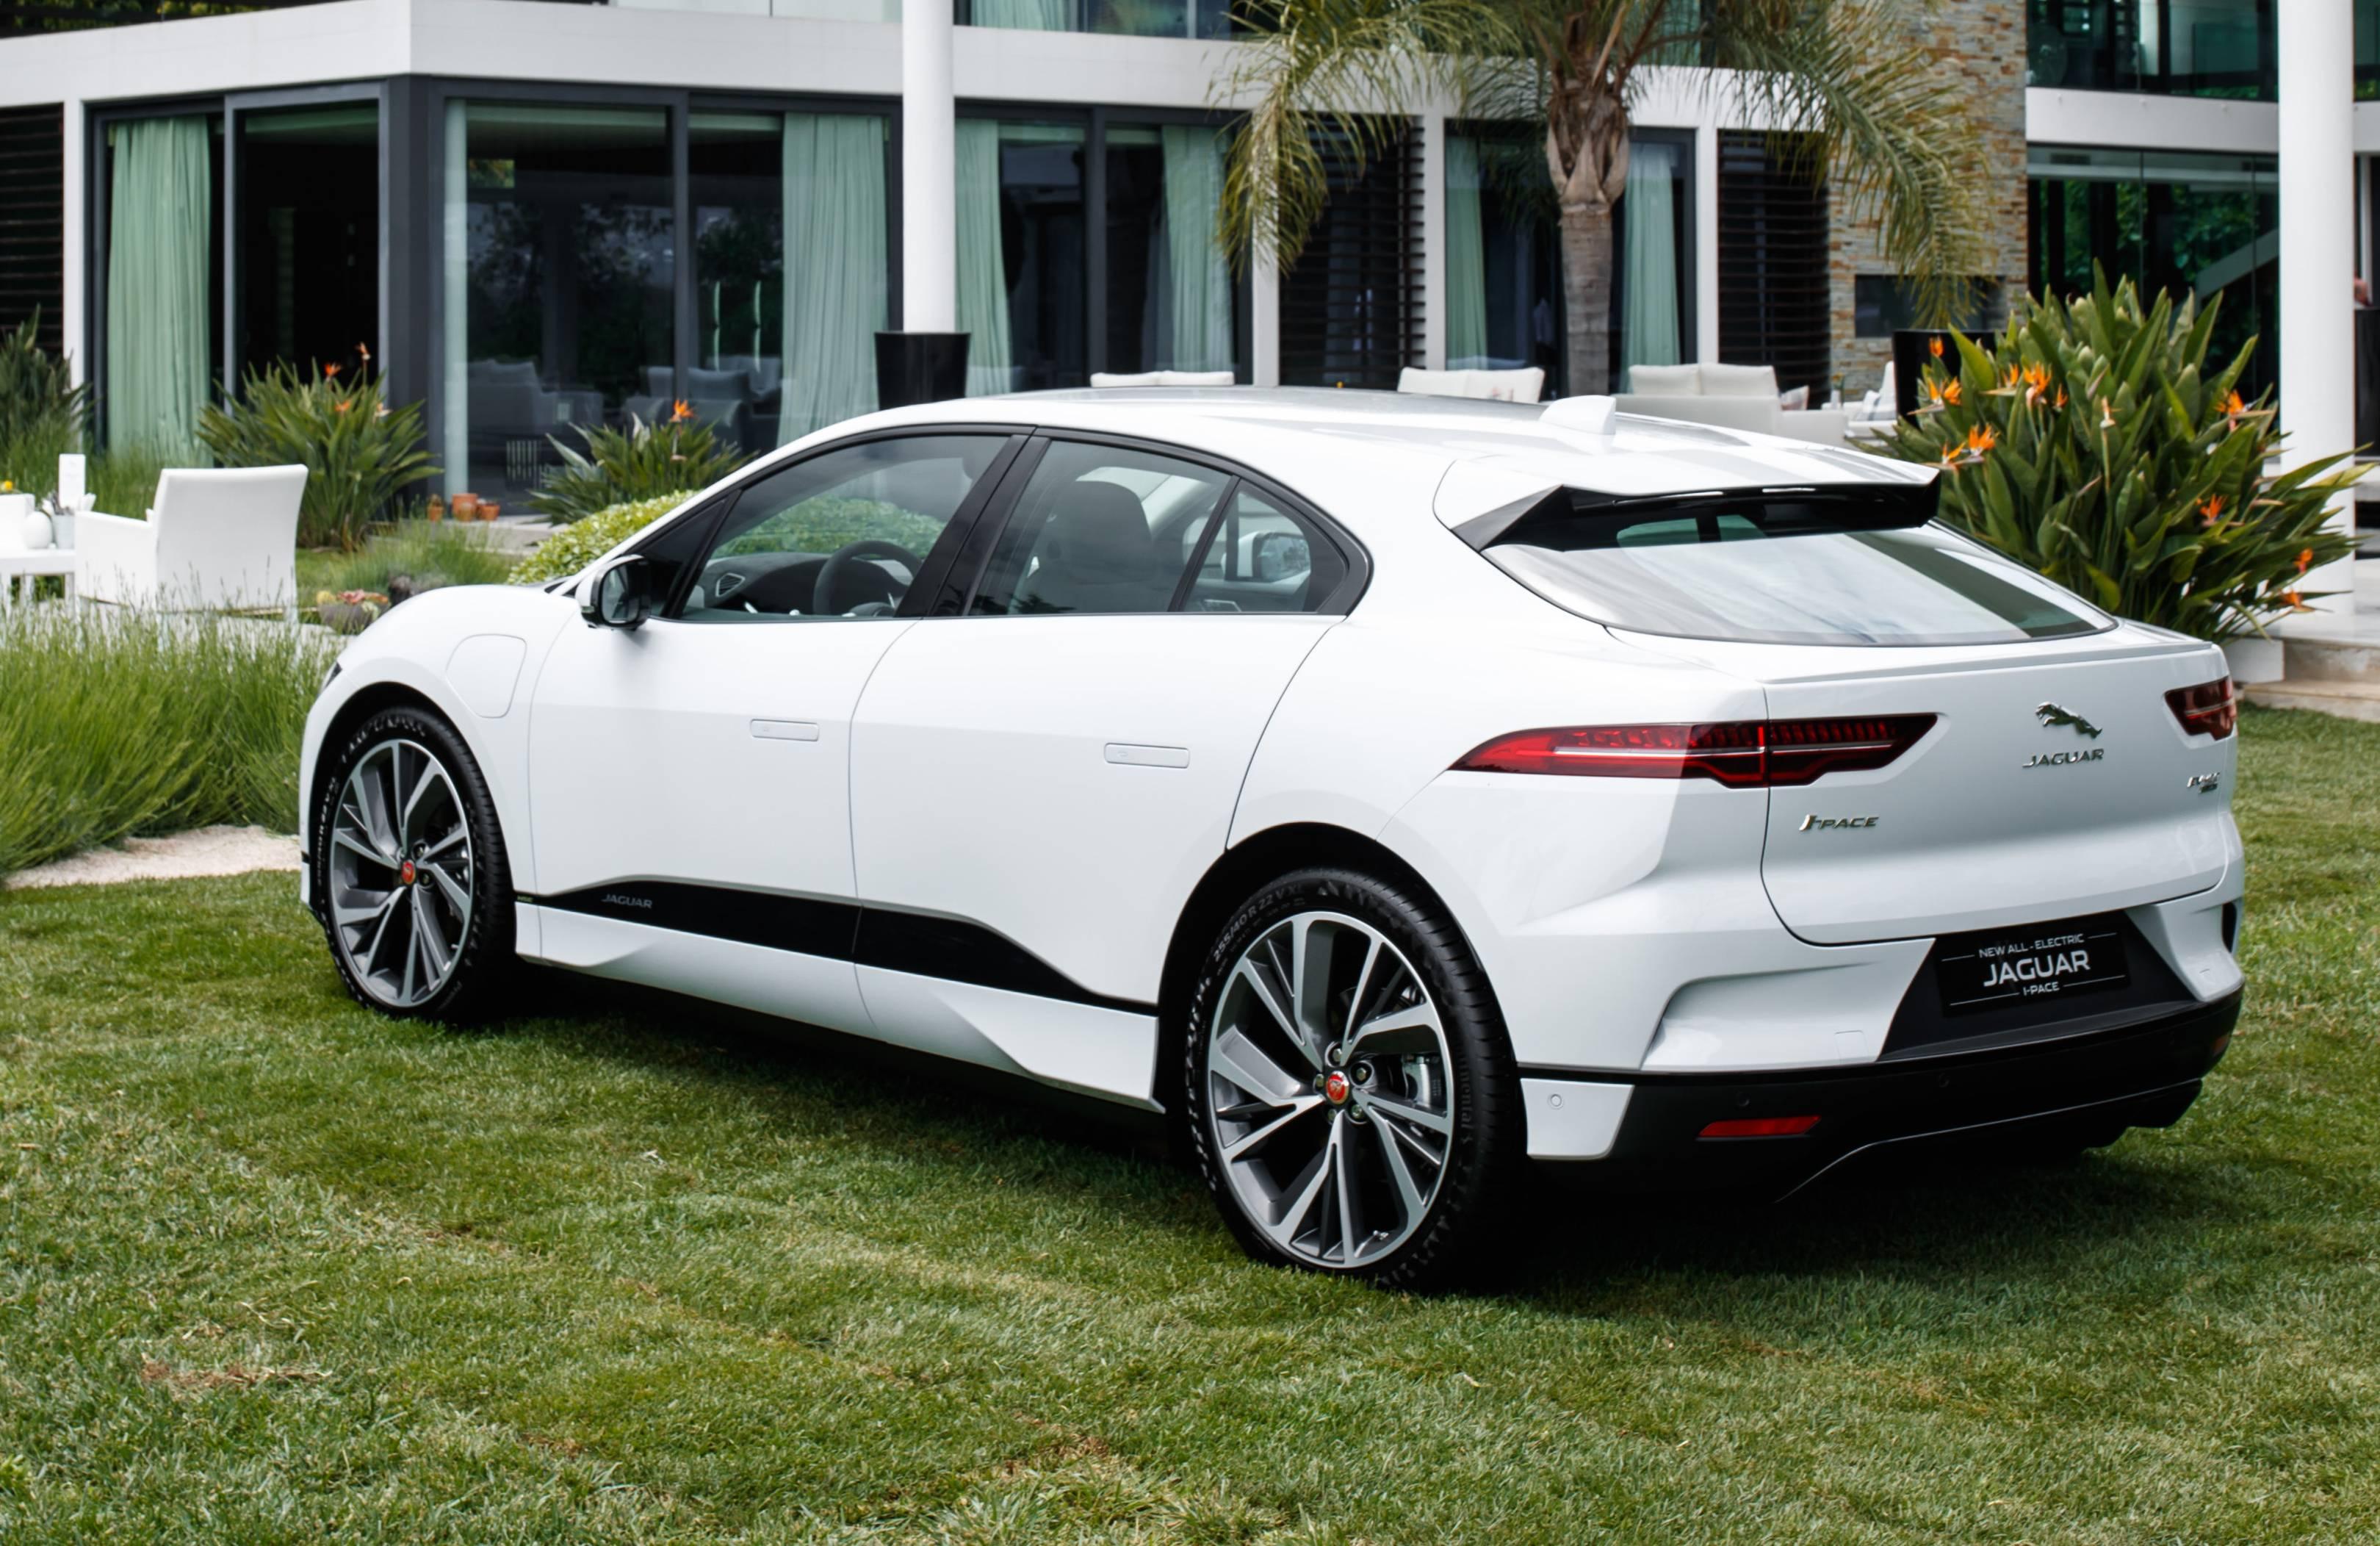 quality cars make salesppm keynes xk jaguar milton dsc who